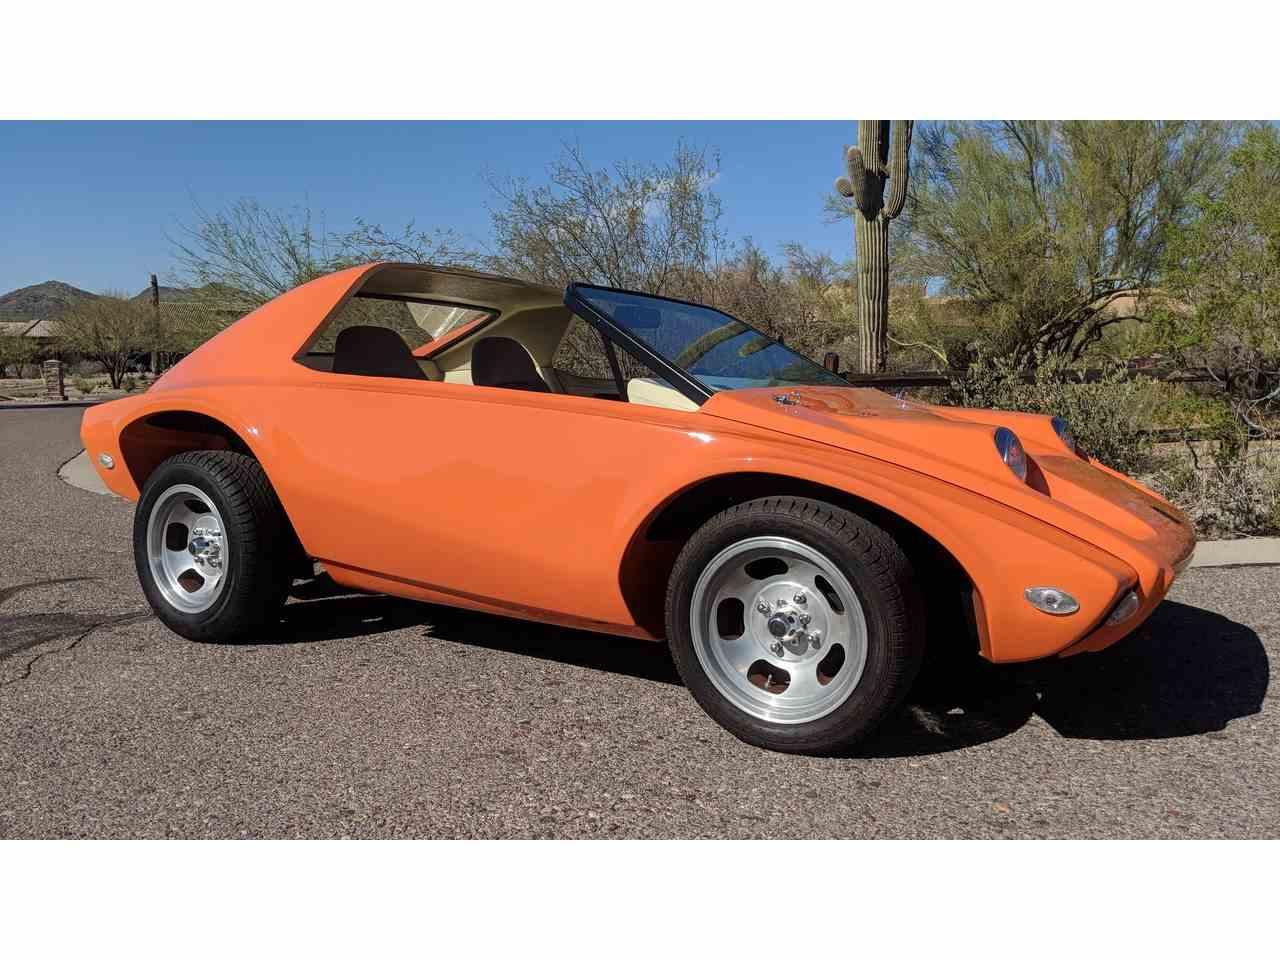 Large Picture of Classic '70 Volkswagen Baja Bug located in North Phoenix Arizona - $11,900.00 - MXZ5